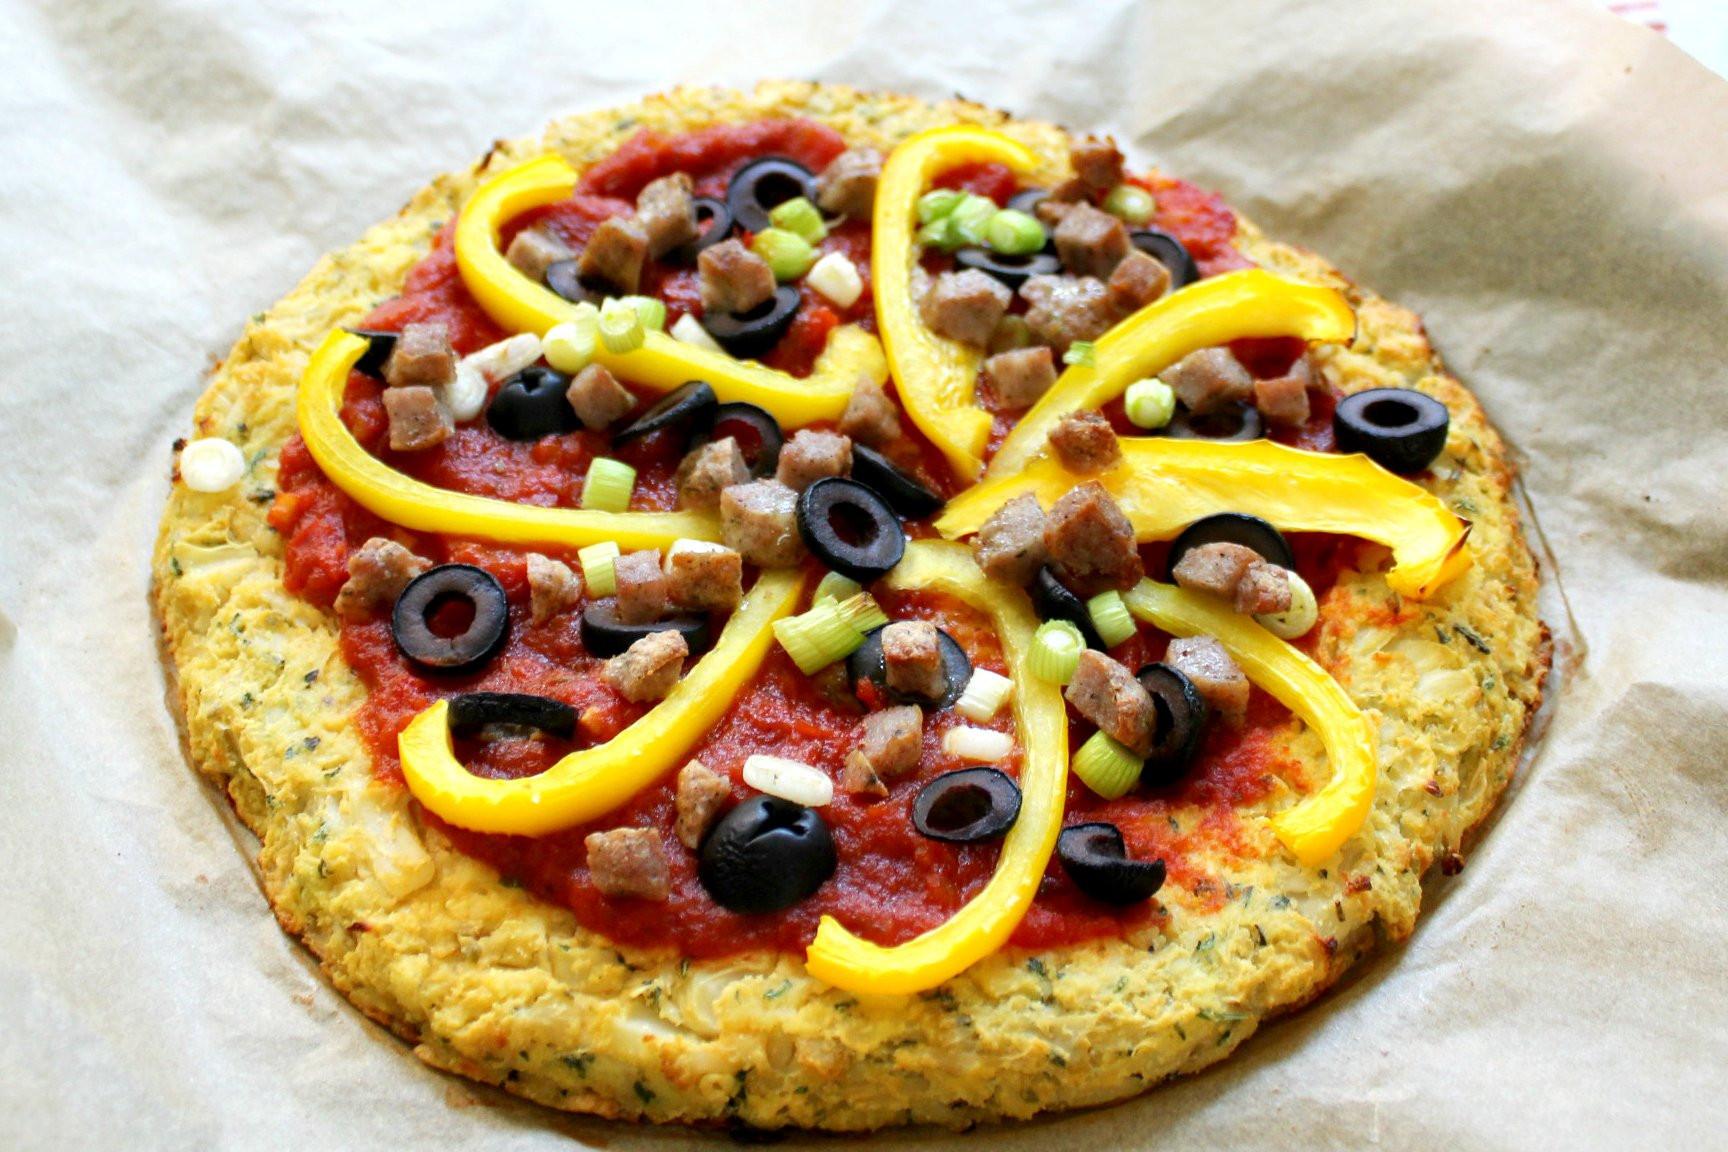 Keto Cauliflower Pizza  Dairy Free Keto Cauliflower Pizza Crust Health Home